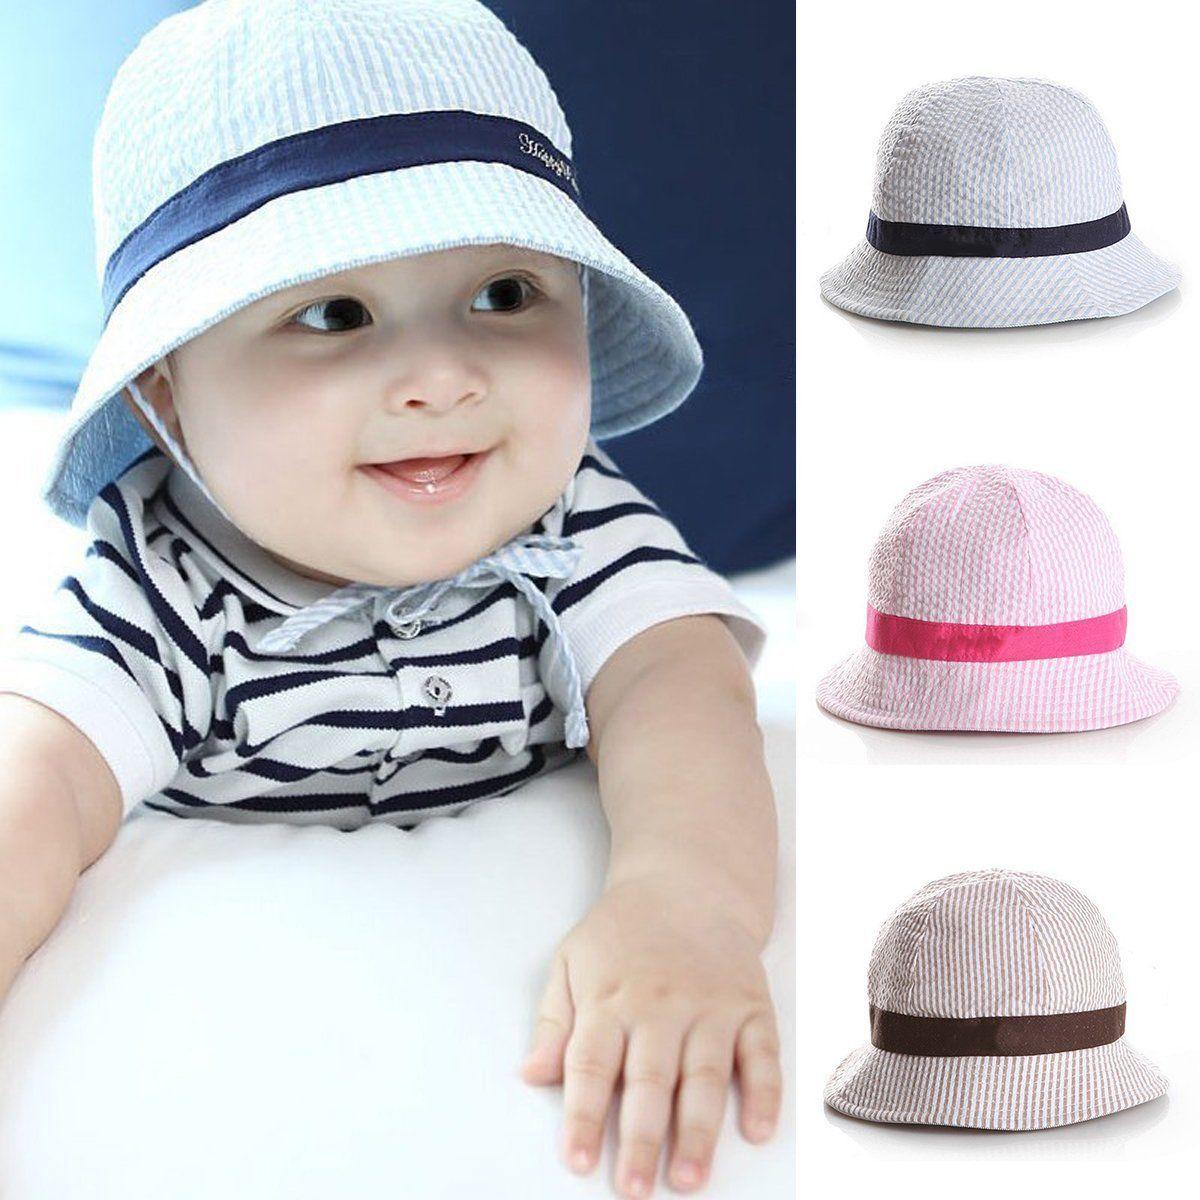 f8583ae5a  2.49 - Toddler Infant Kids Sun Cap Summer Outdoor Baby Girls Boys ...